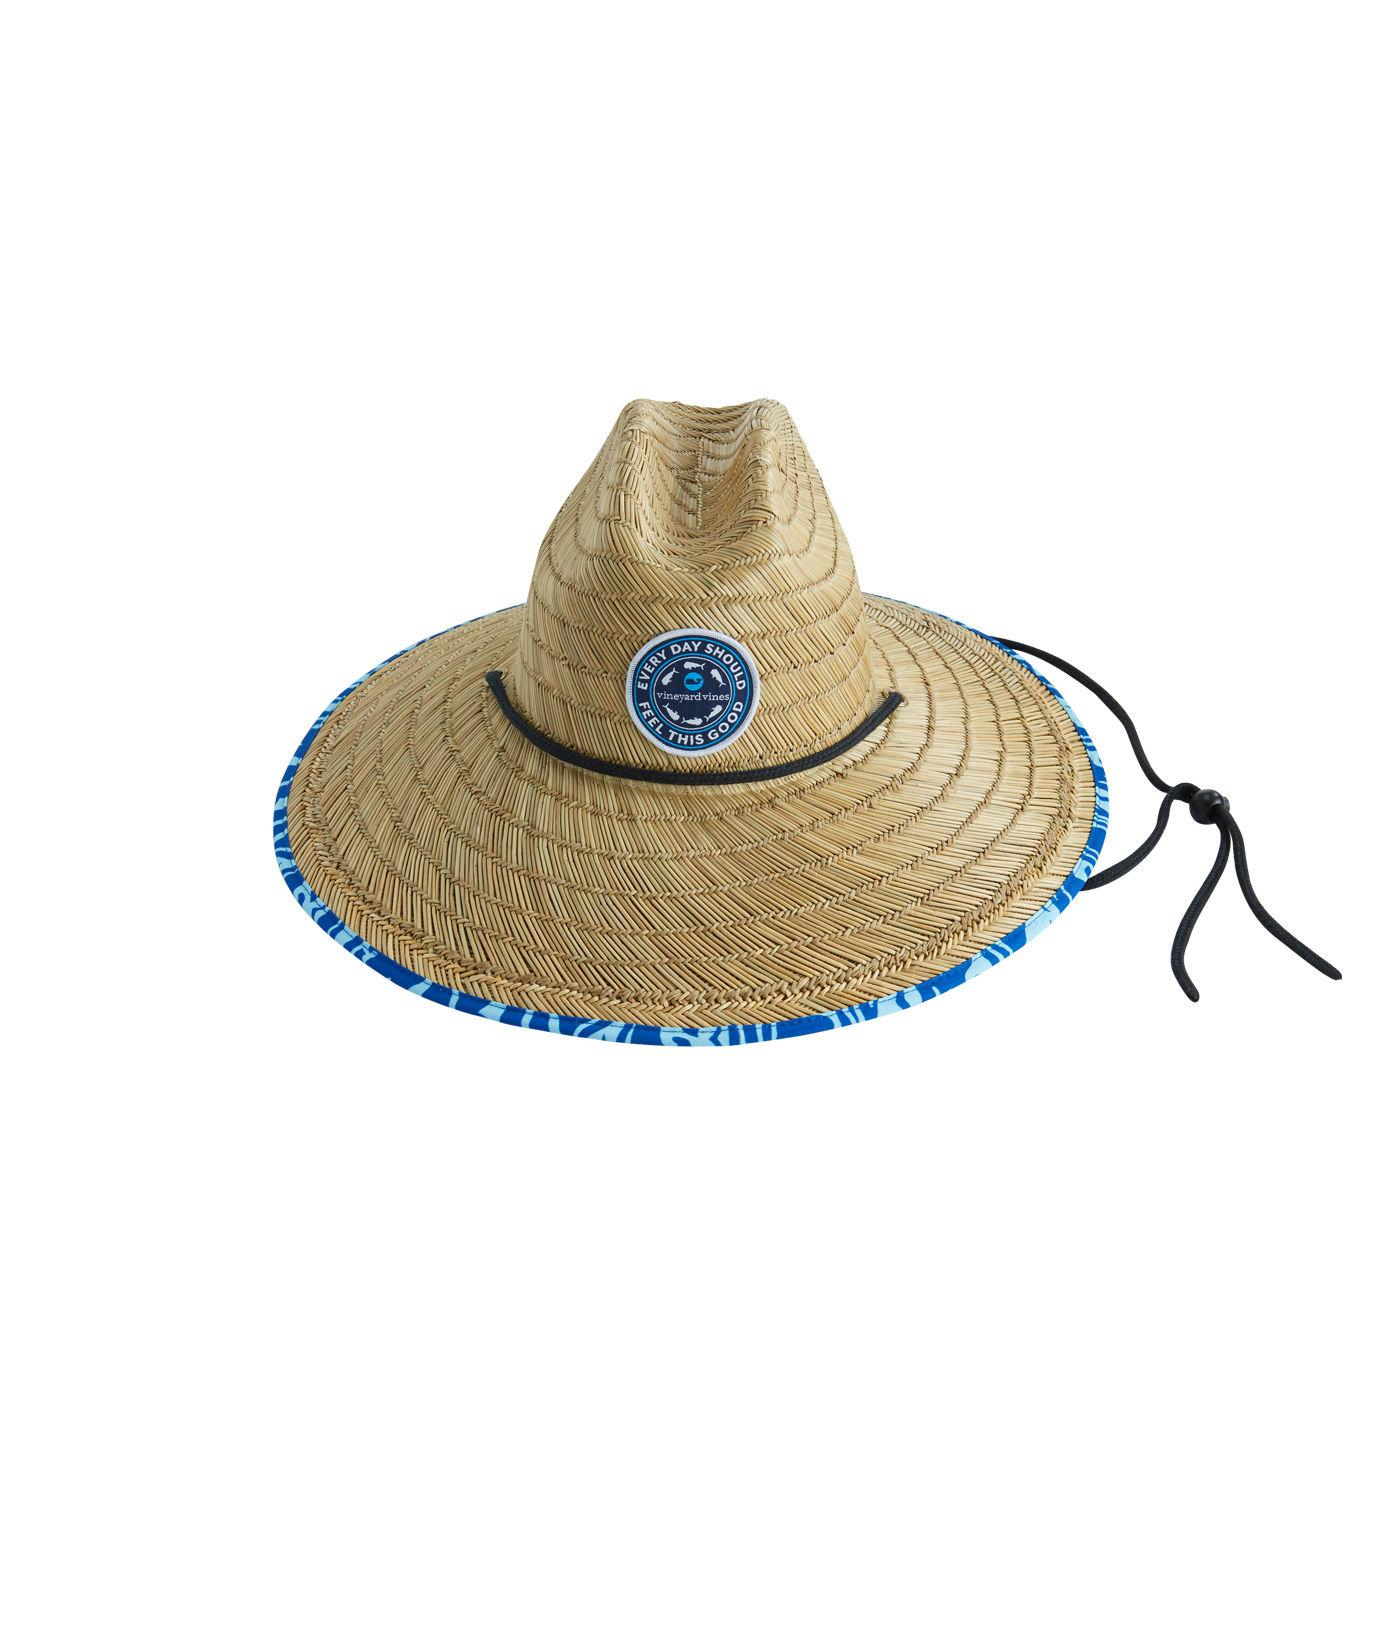 828847136d0 Lifeguard Hat Straw - Hat HD Image Ukjugs.Org